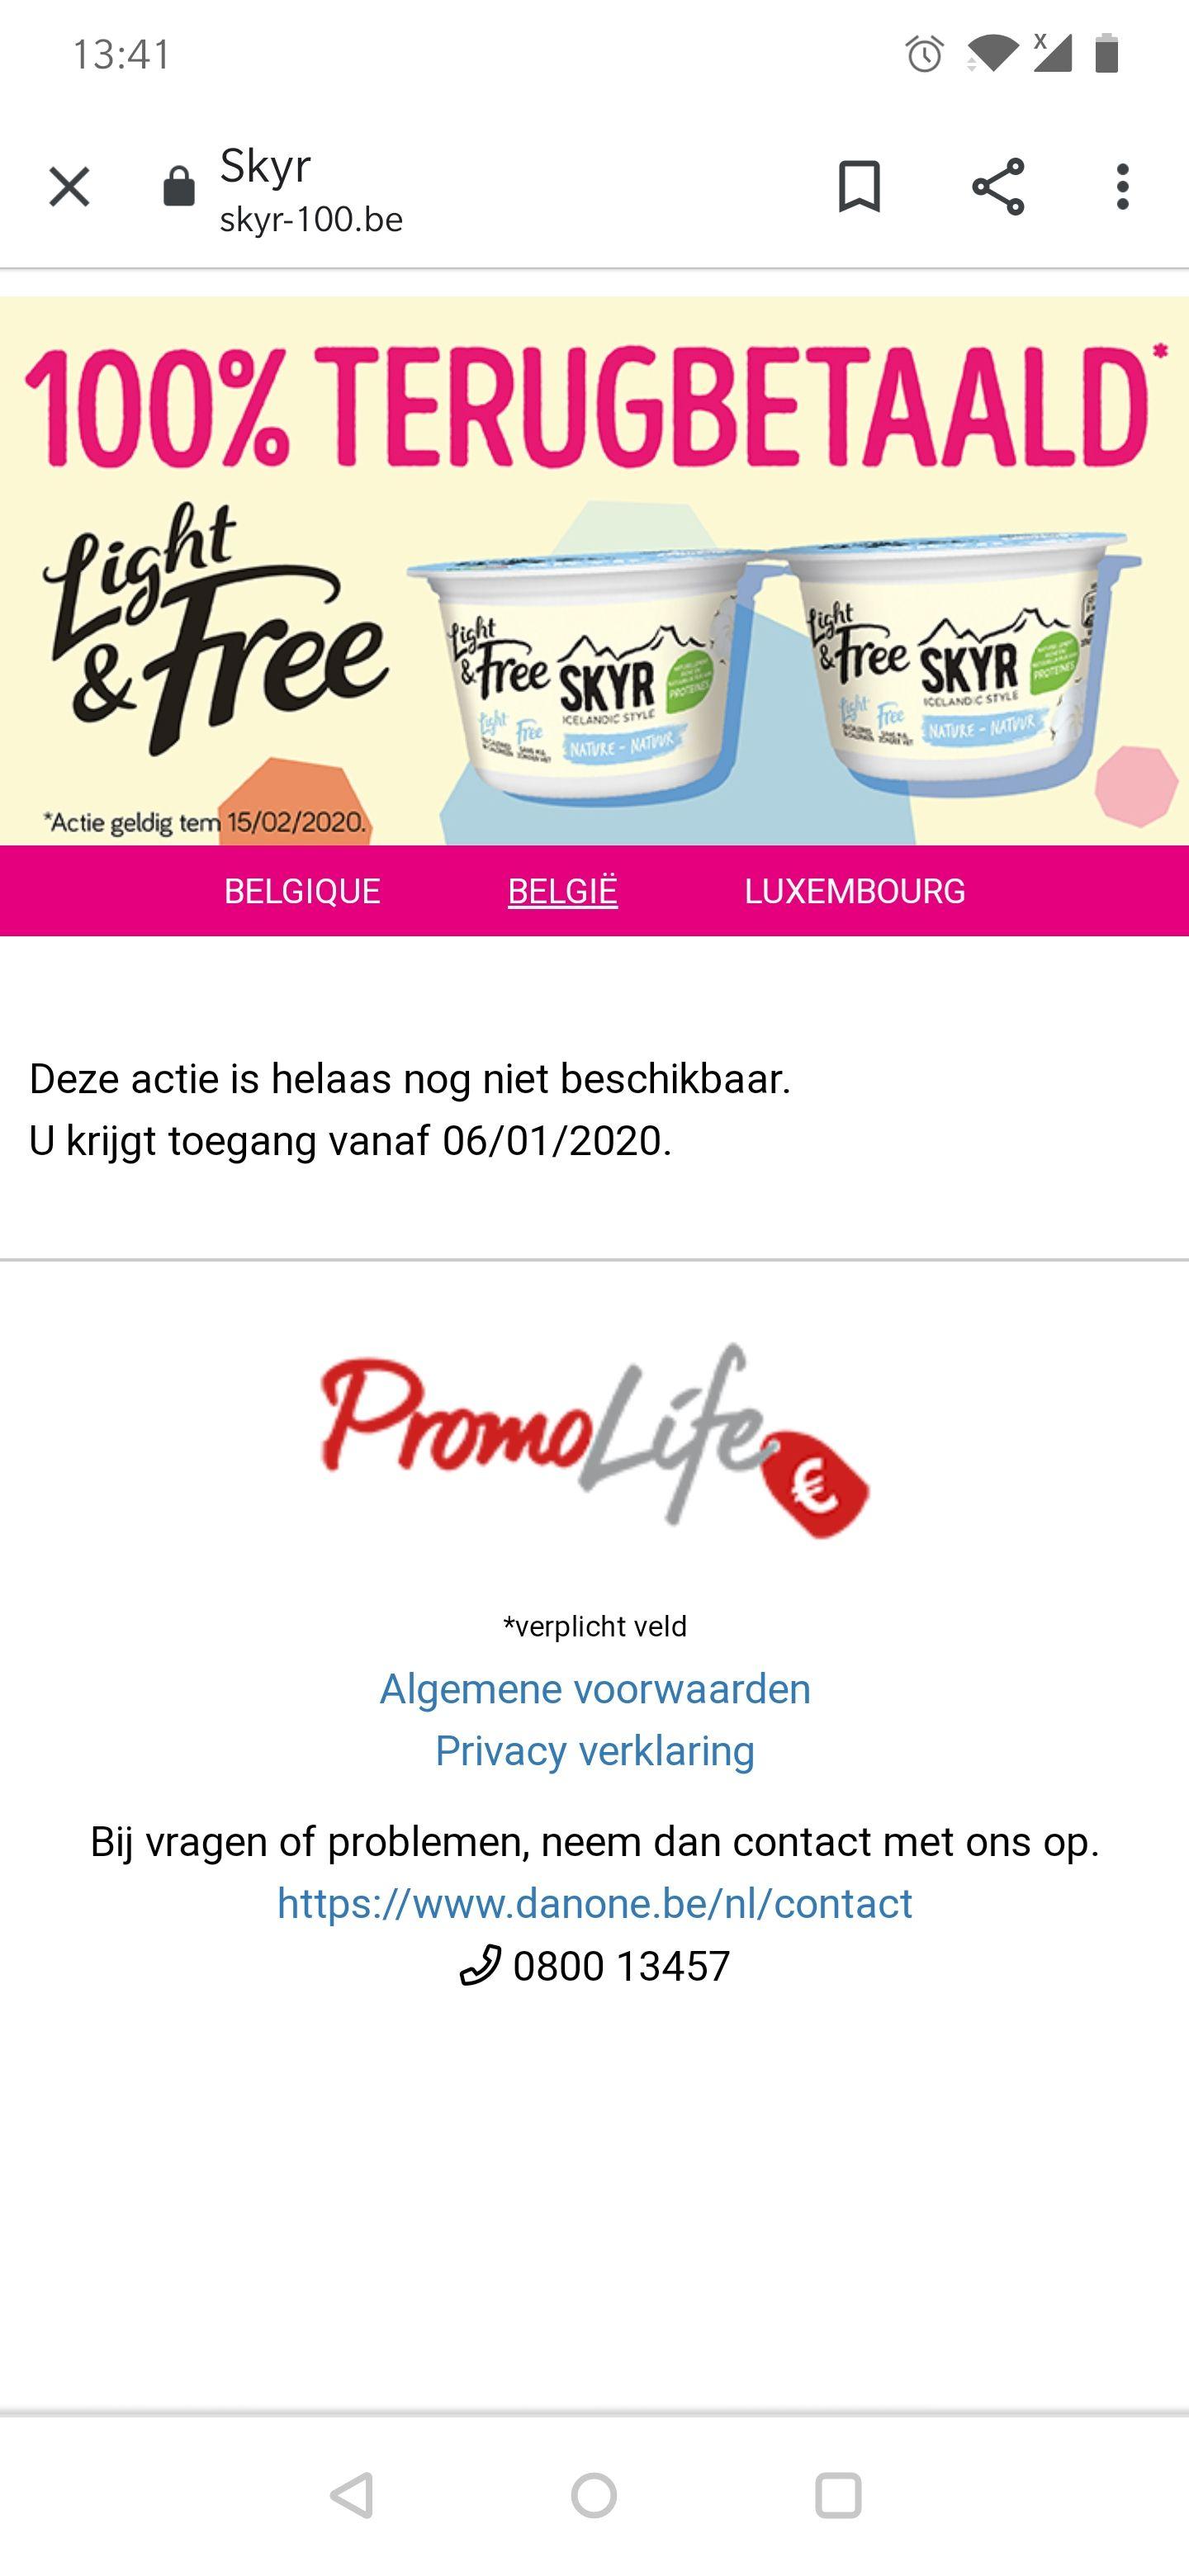 [GRENSDEAL BELGIË] 100% terugbetaald Skyr light & free